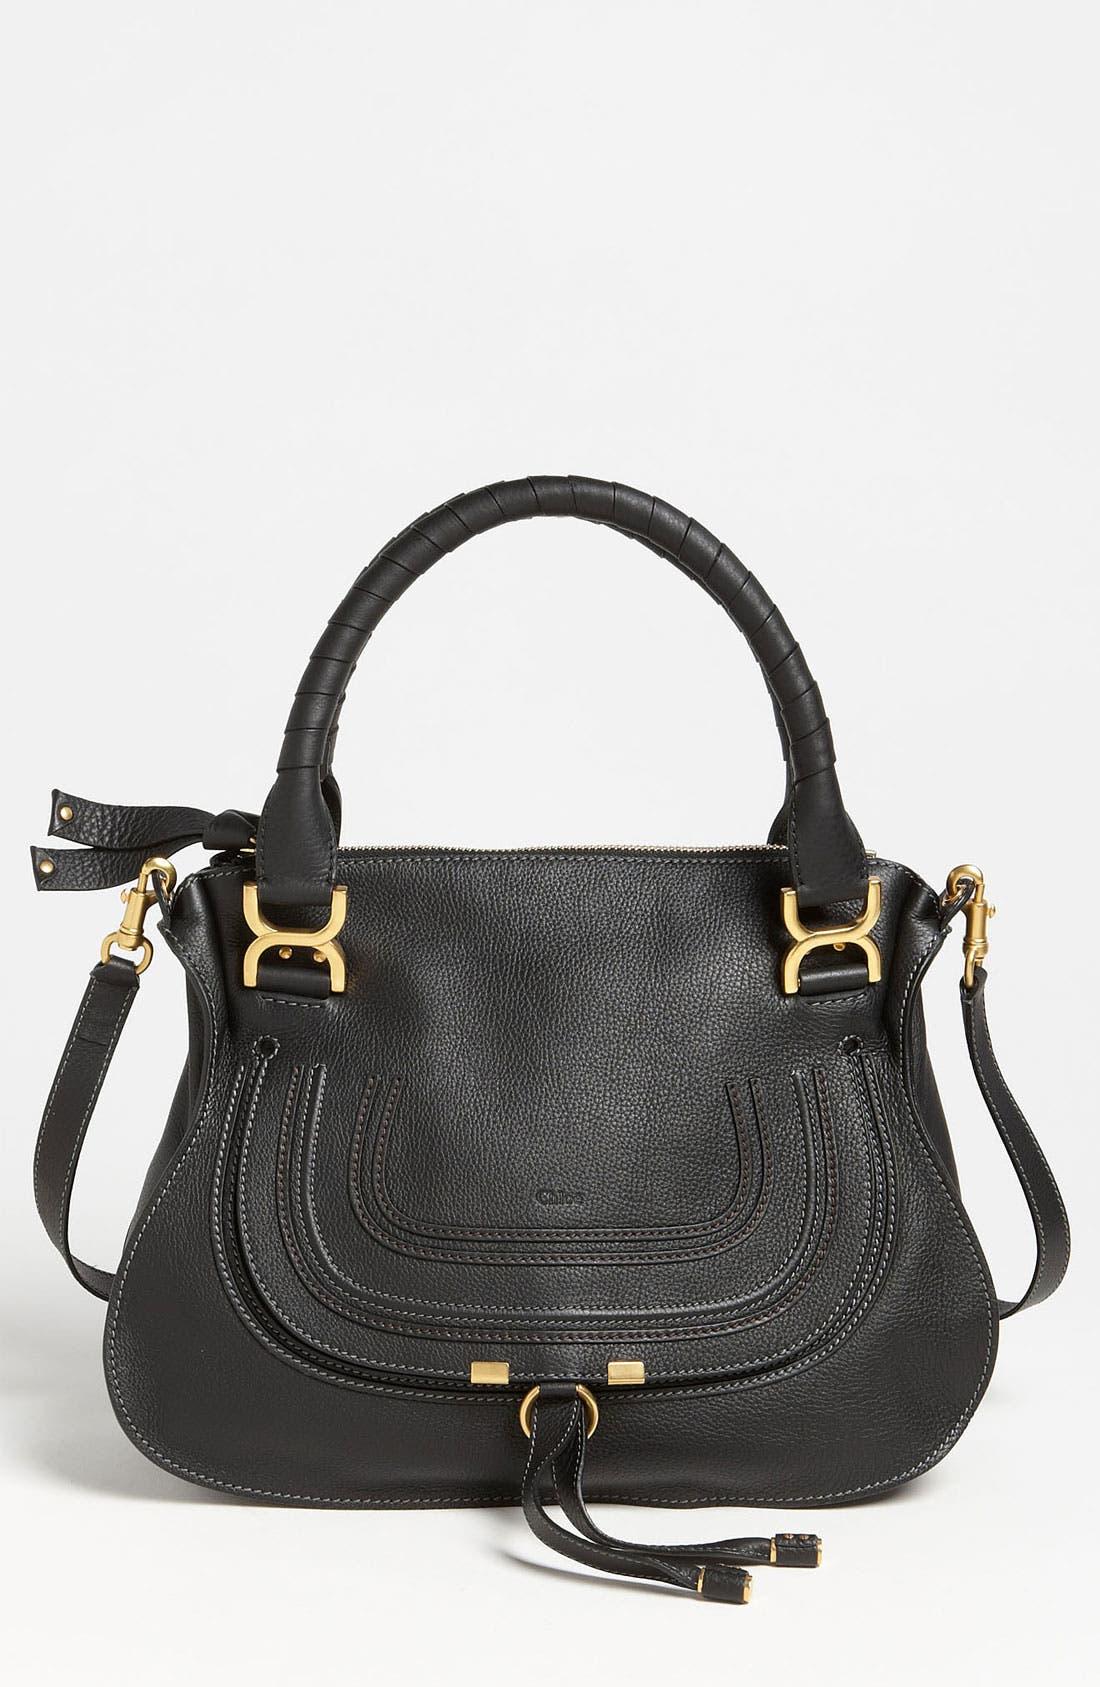 CHLOÉ 'Medium Marcie' Leather Satchel, Main, color, BLACK GOLD HRDWRE